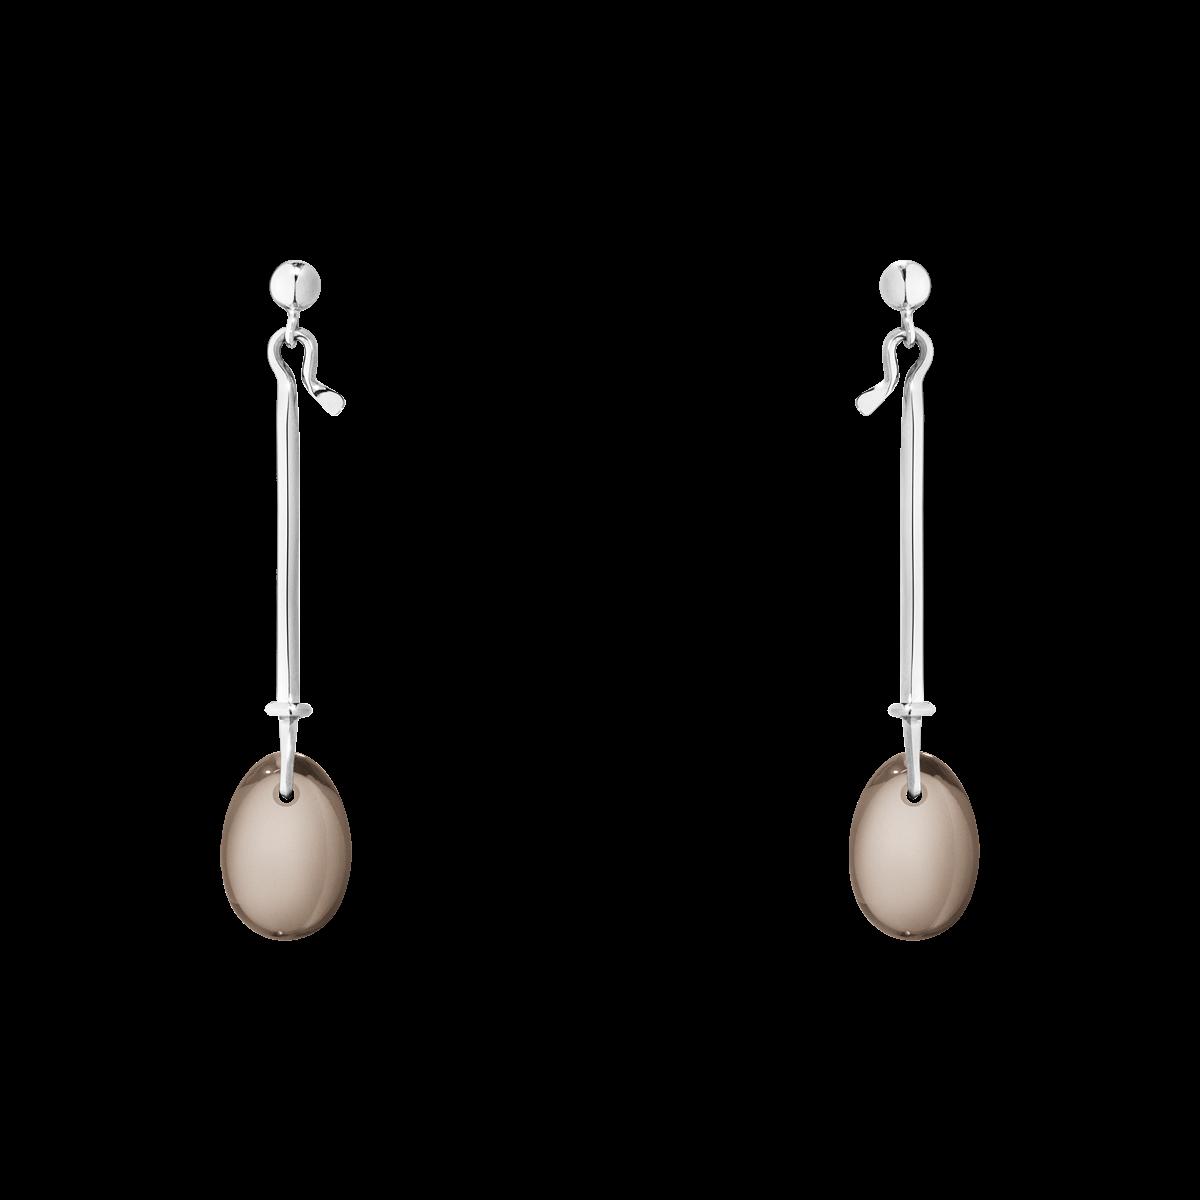 f5e08a737 dew drop earrings sterling silver with smokey quartz. GEORGJENSEN